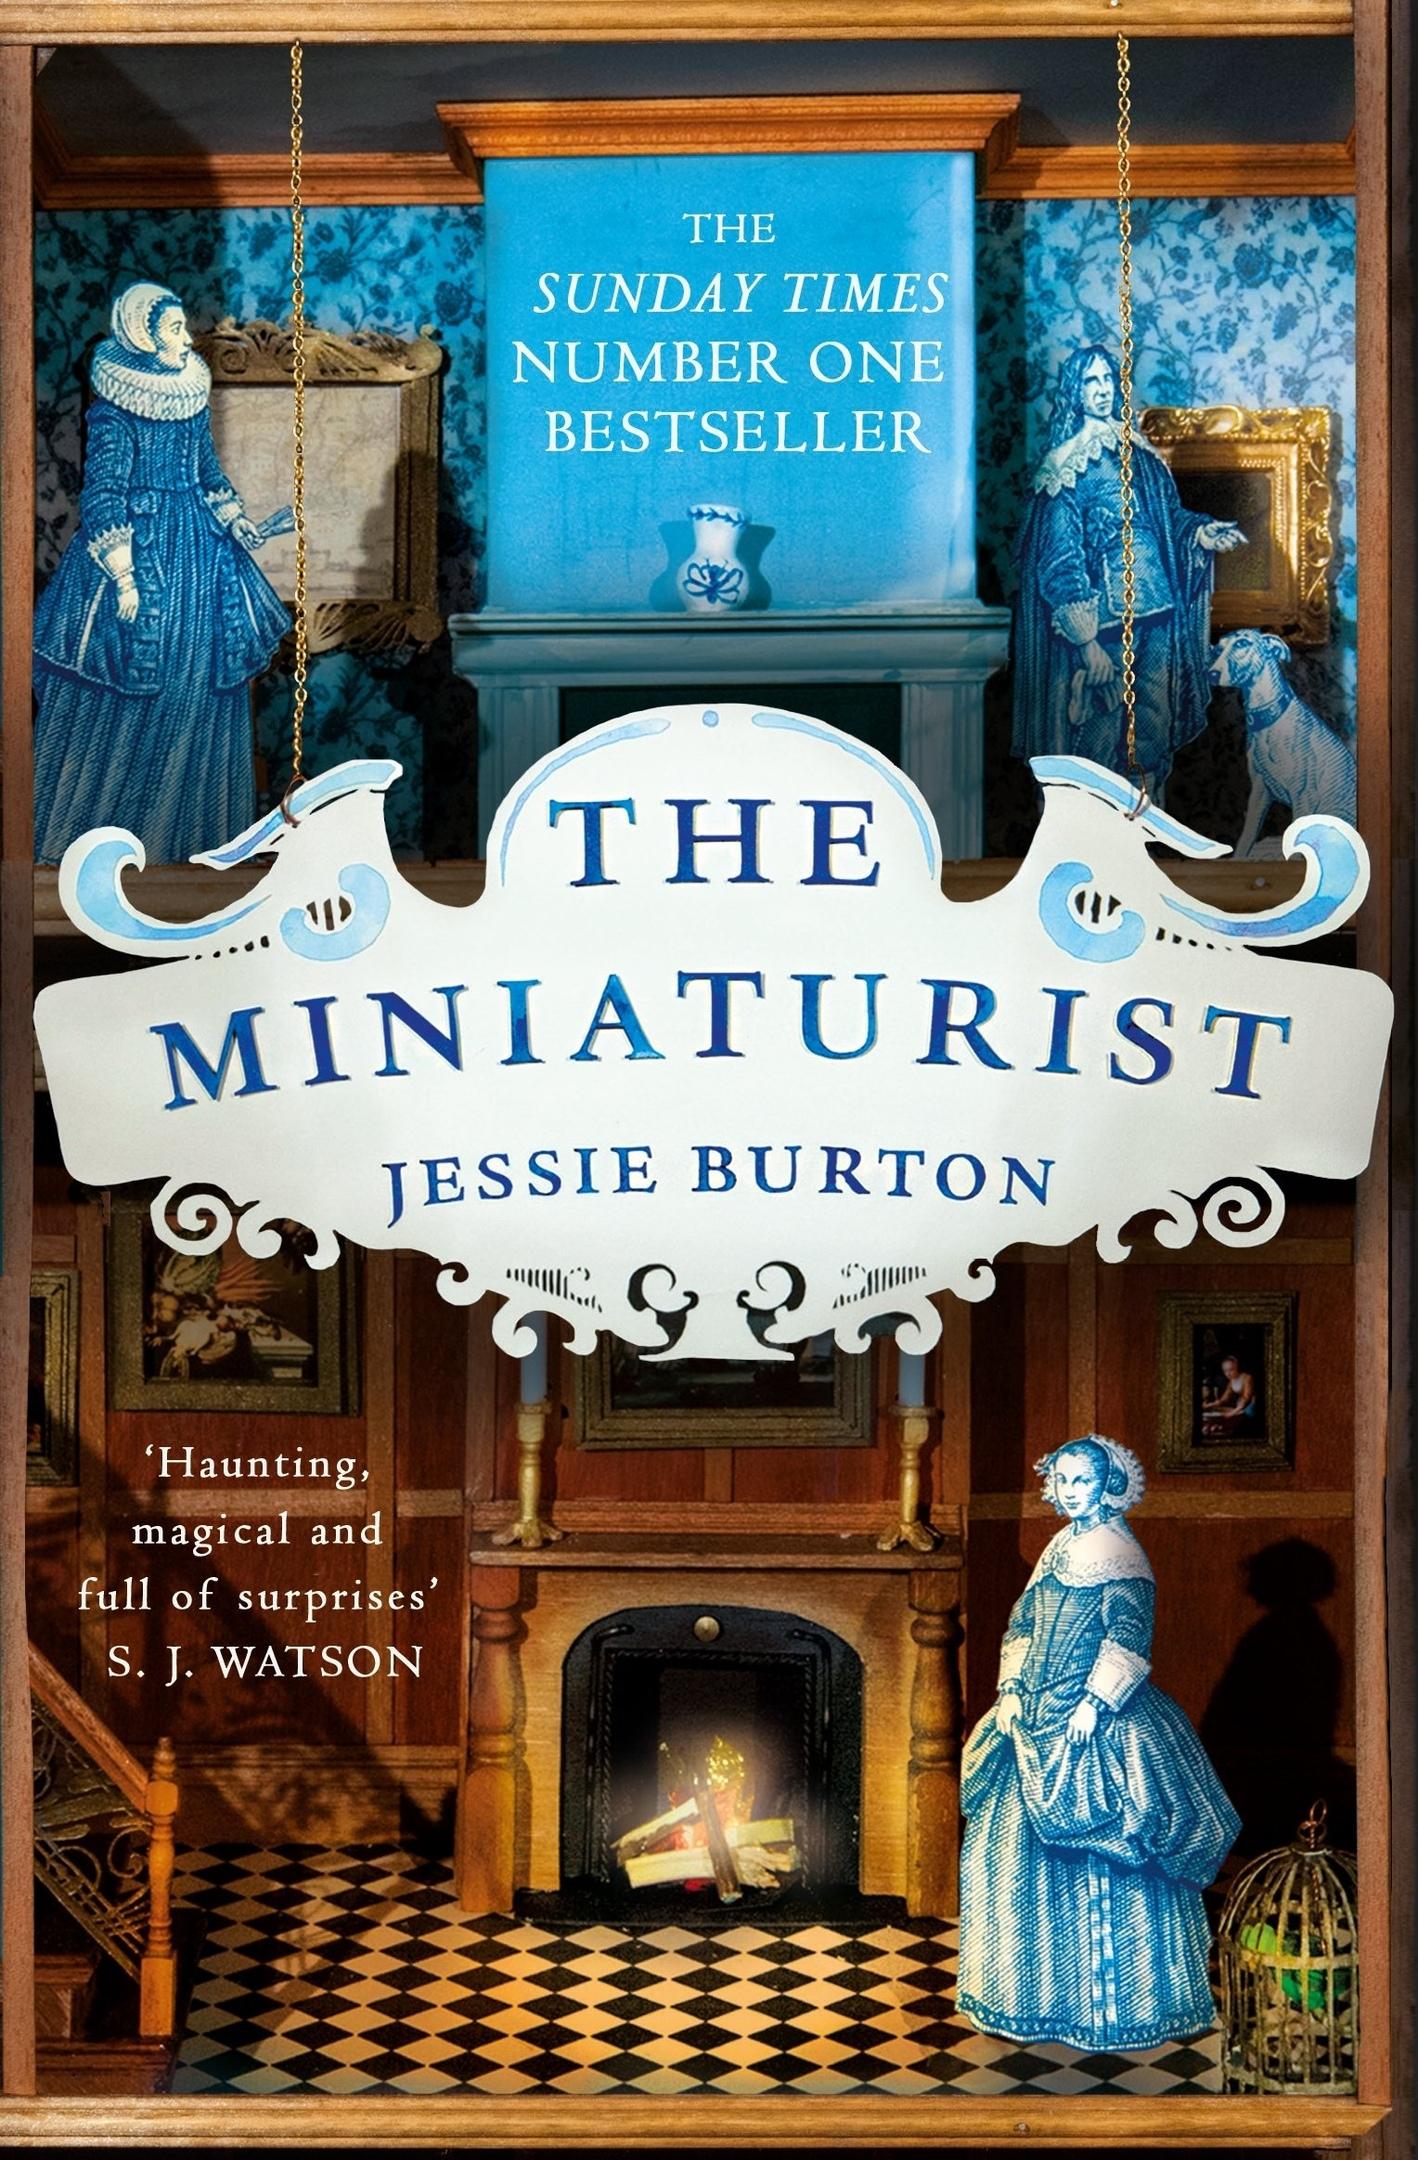 Jessie Burton – The Miniaturist Genre: Author: